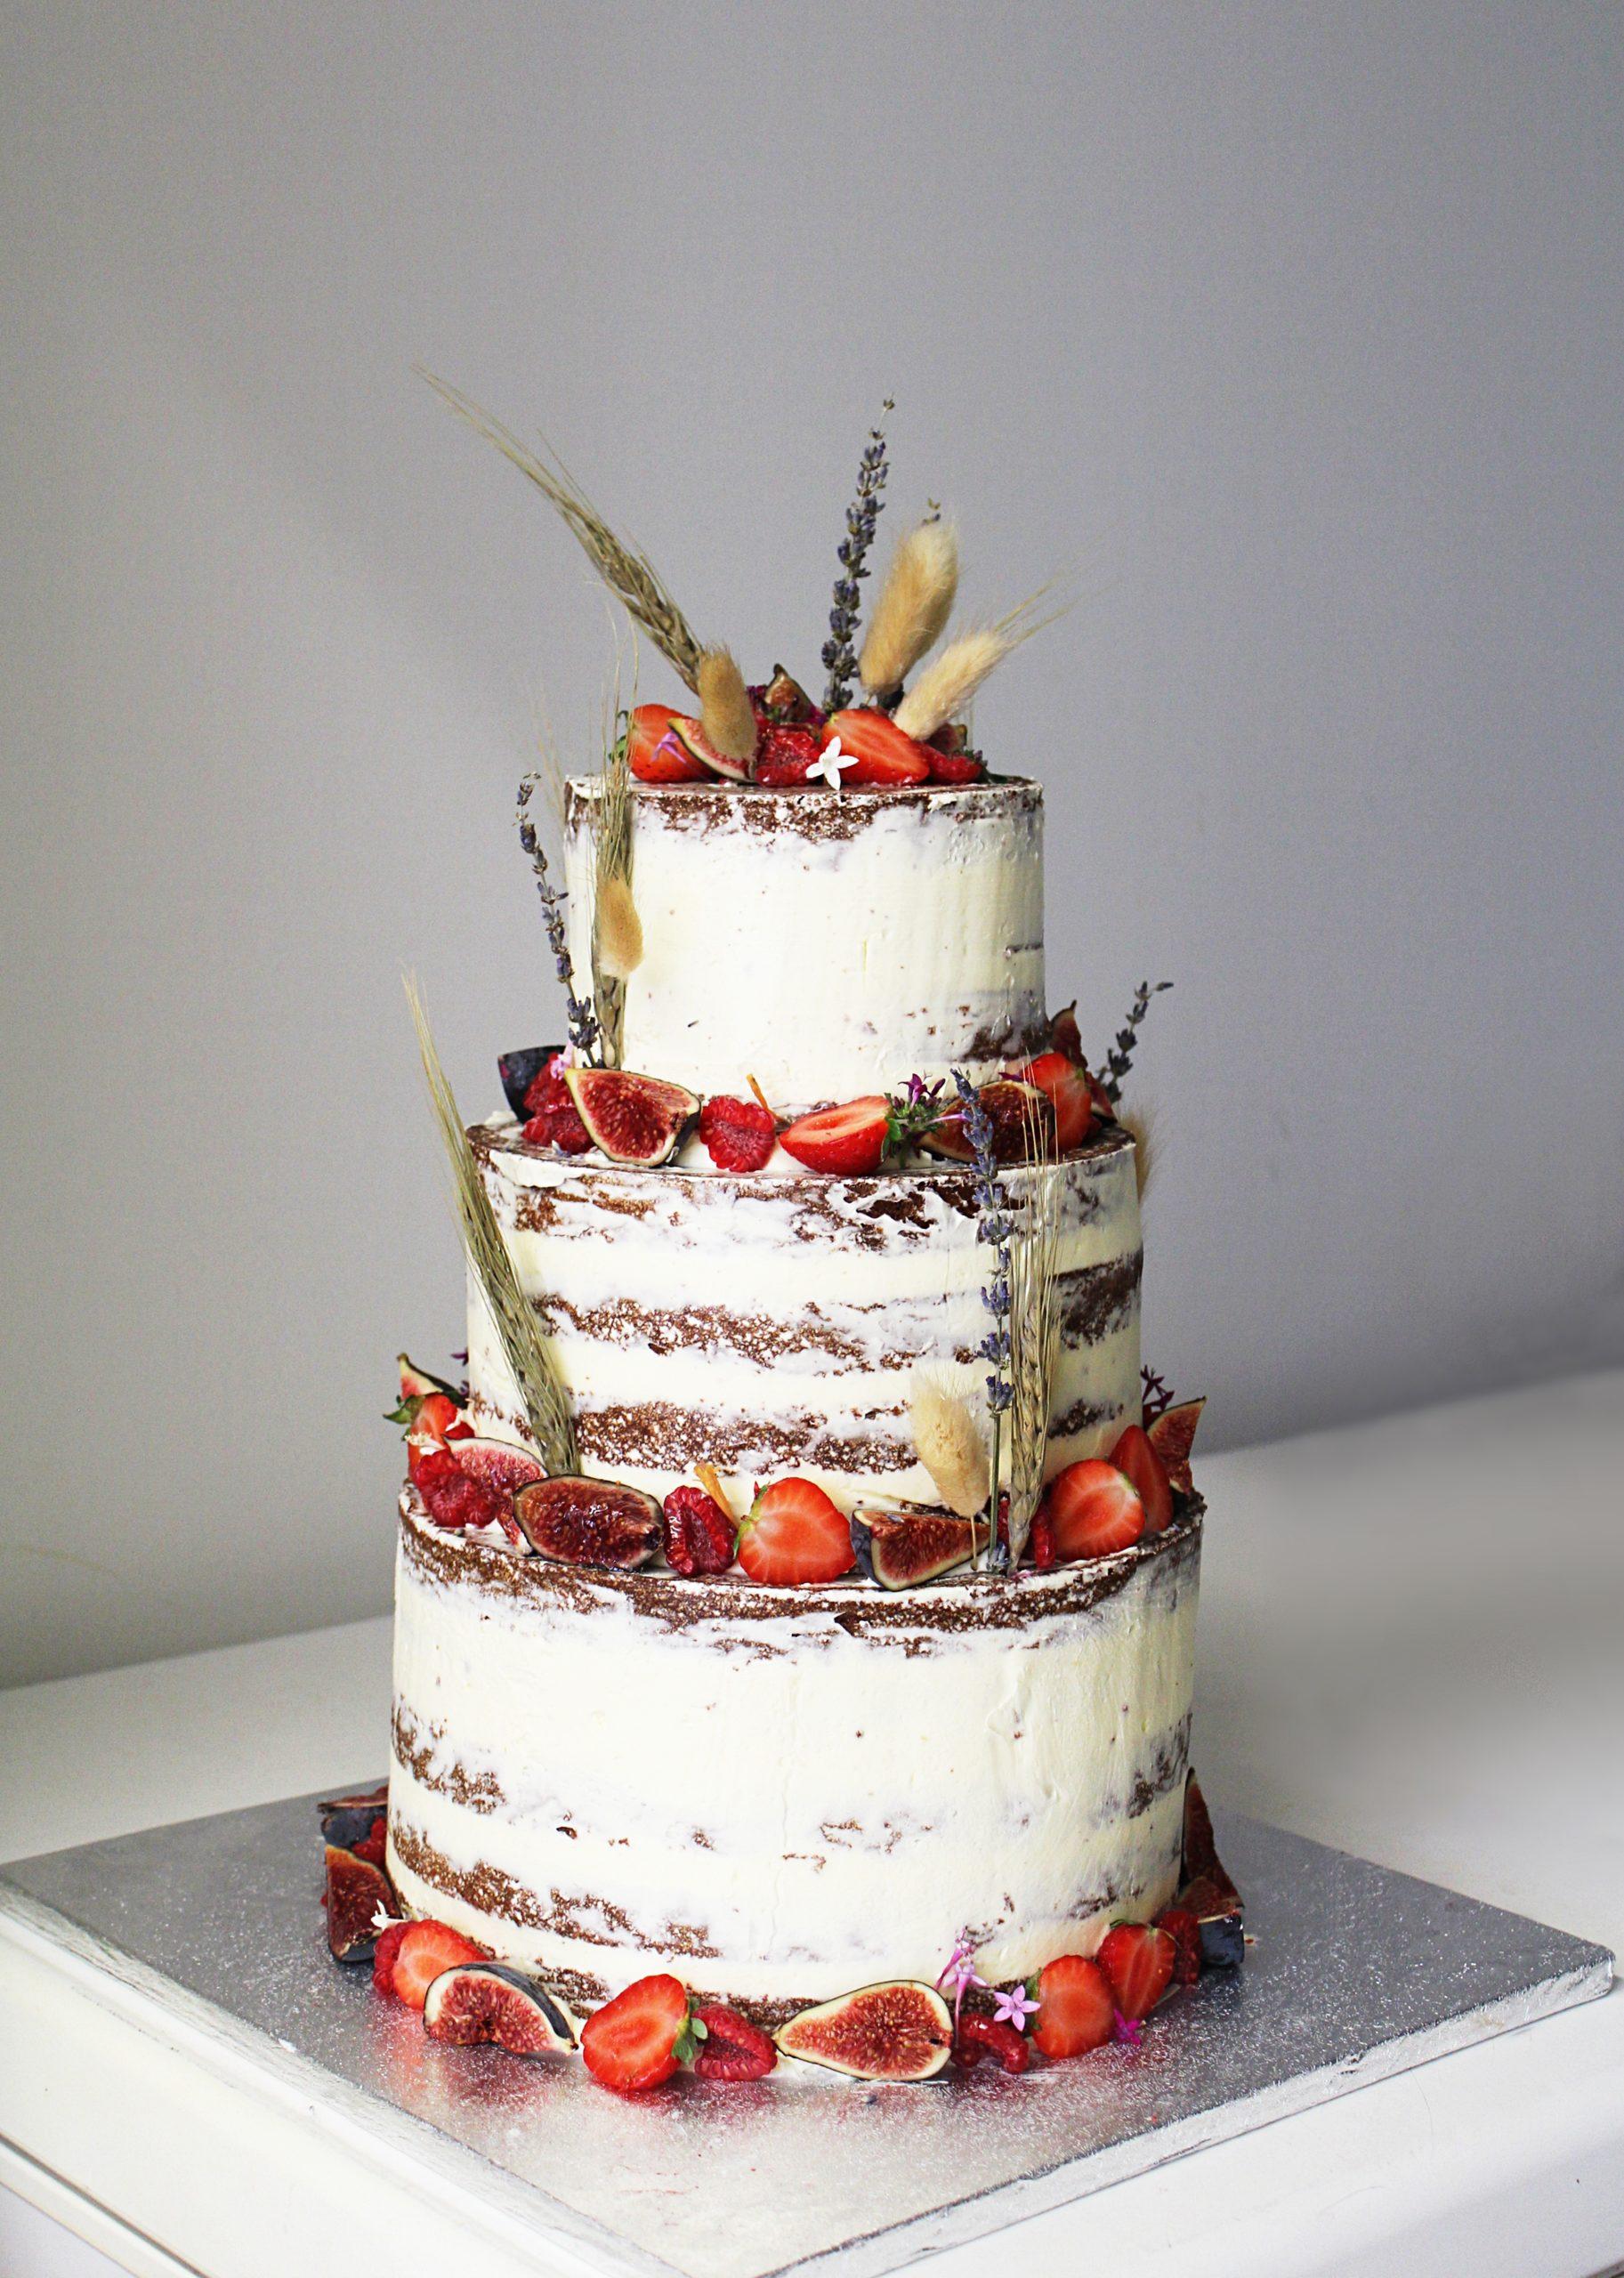 LE DOUX FRUIT PATISSERIE ARTISANALE MONTPELLIER _ WEDDING CAKE